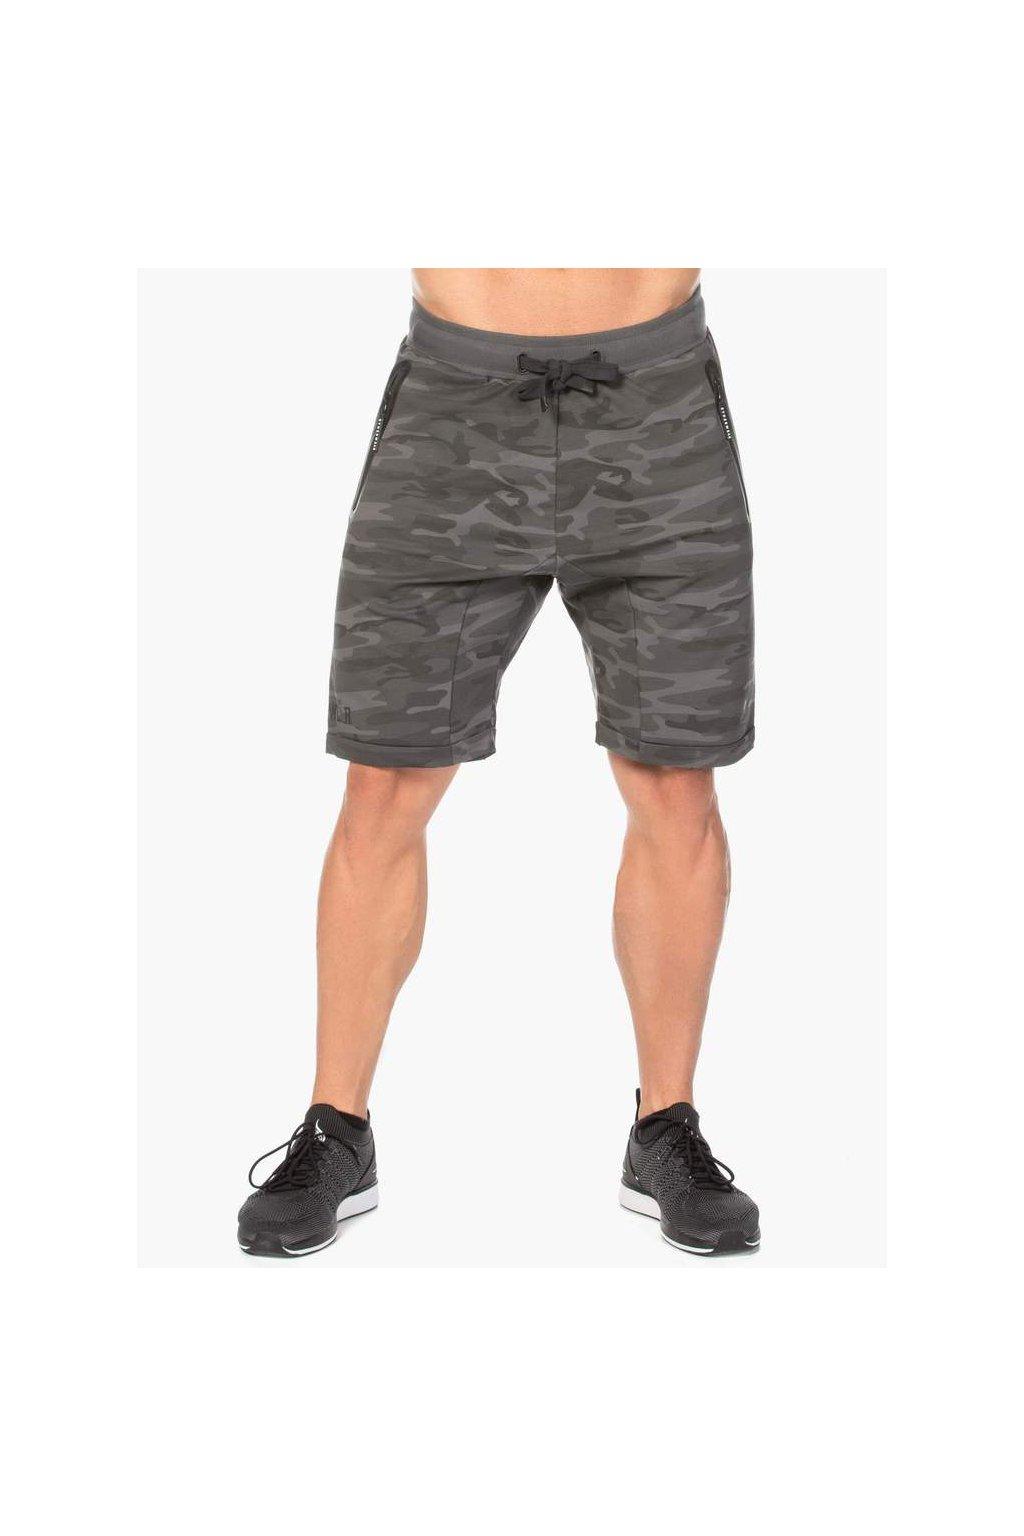 camo fleece track short black camo clothing ryderwear 915439 1000x1000